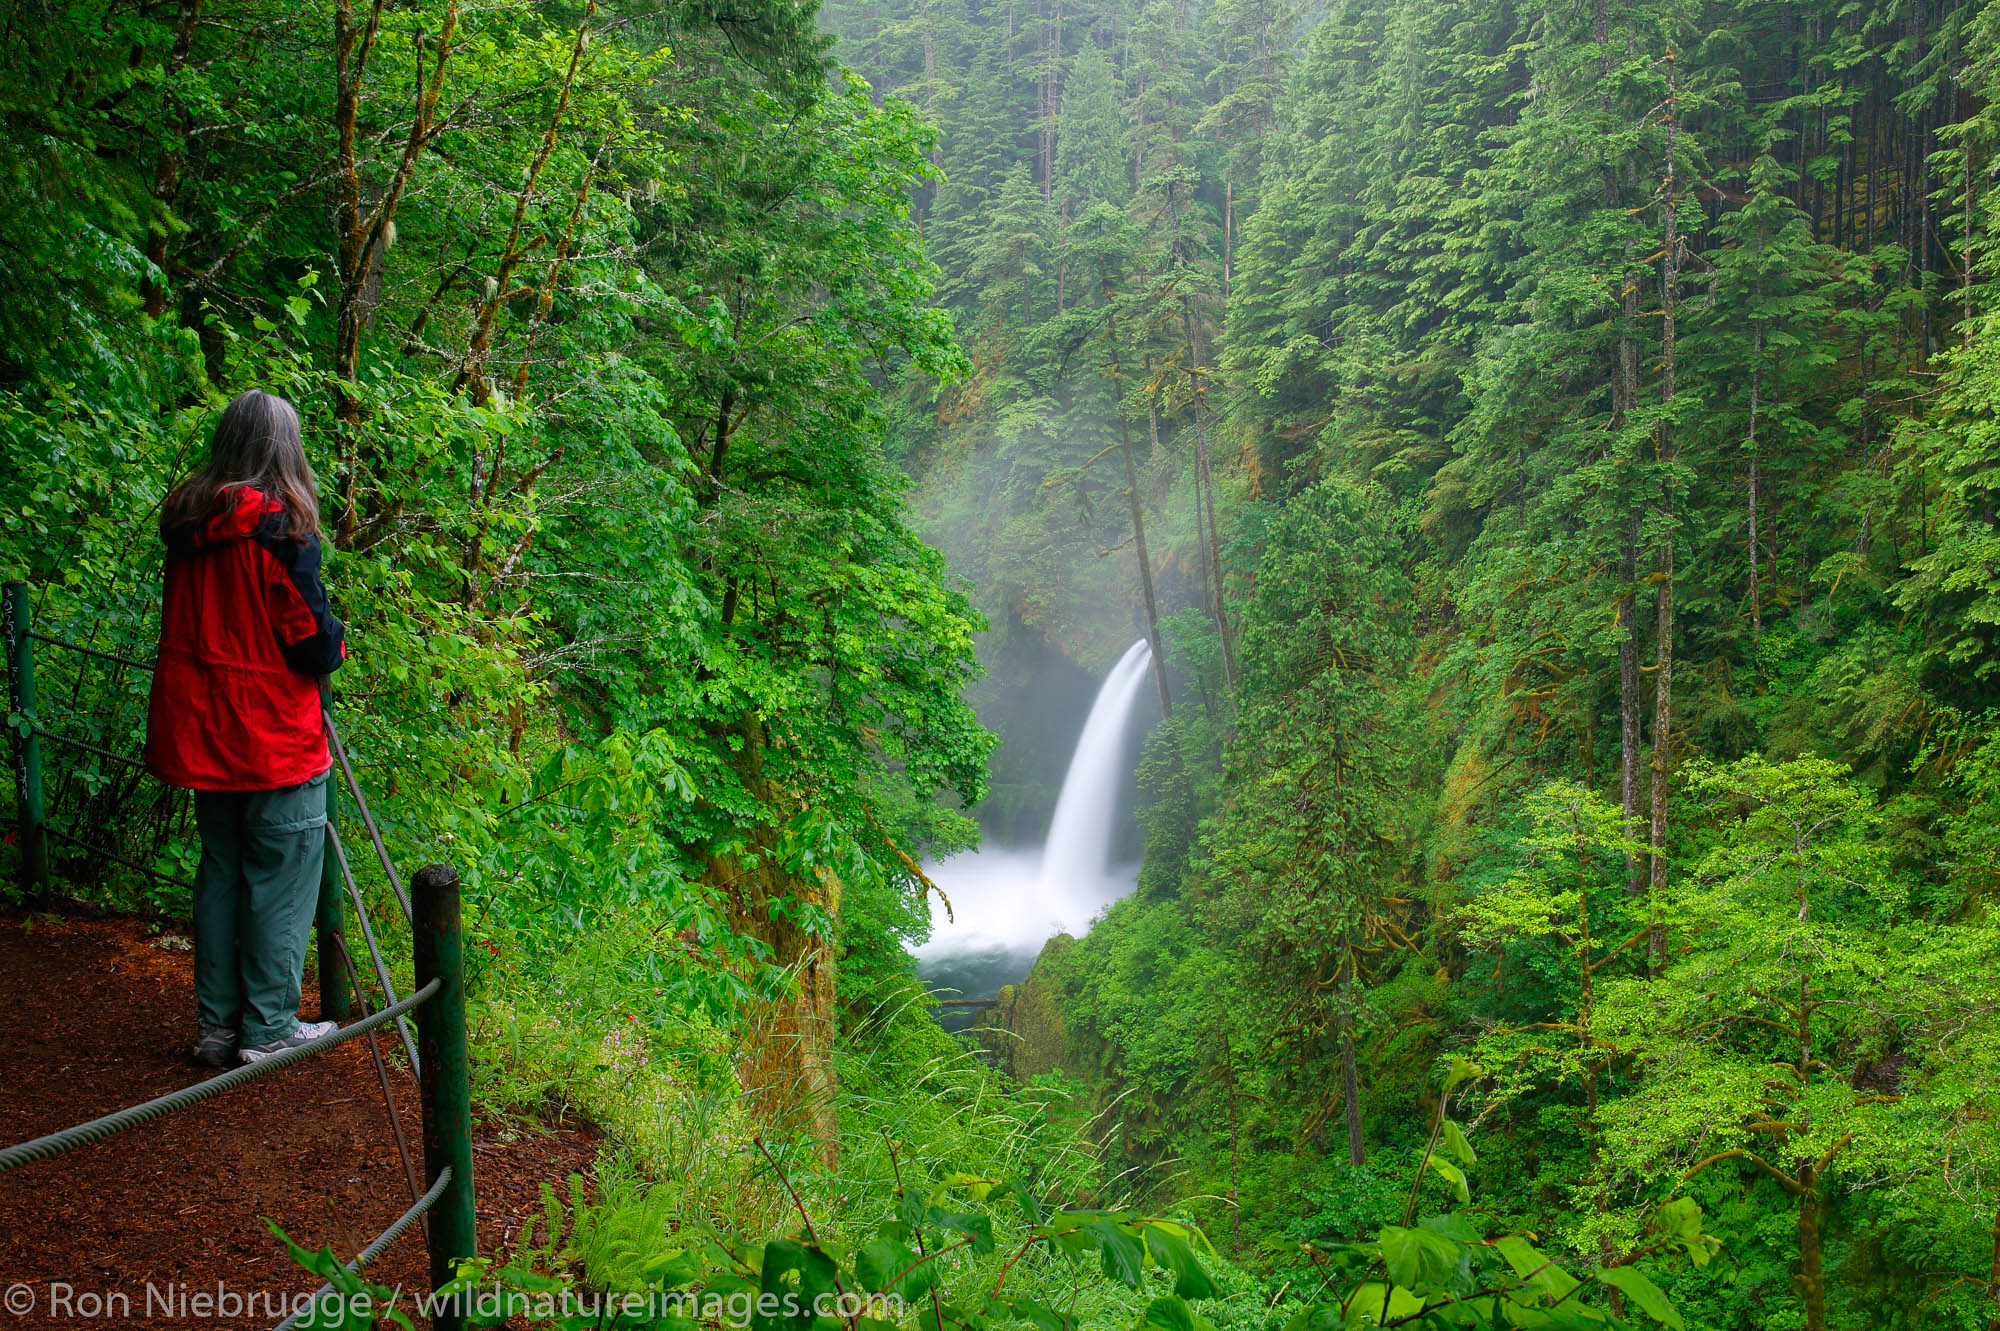 A visitor (mr) views the Metlako Falls along the Eagle Creek Trail, Columbia River Gorge National Scenic Area, Oregon.